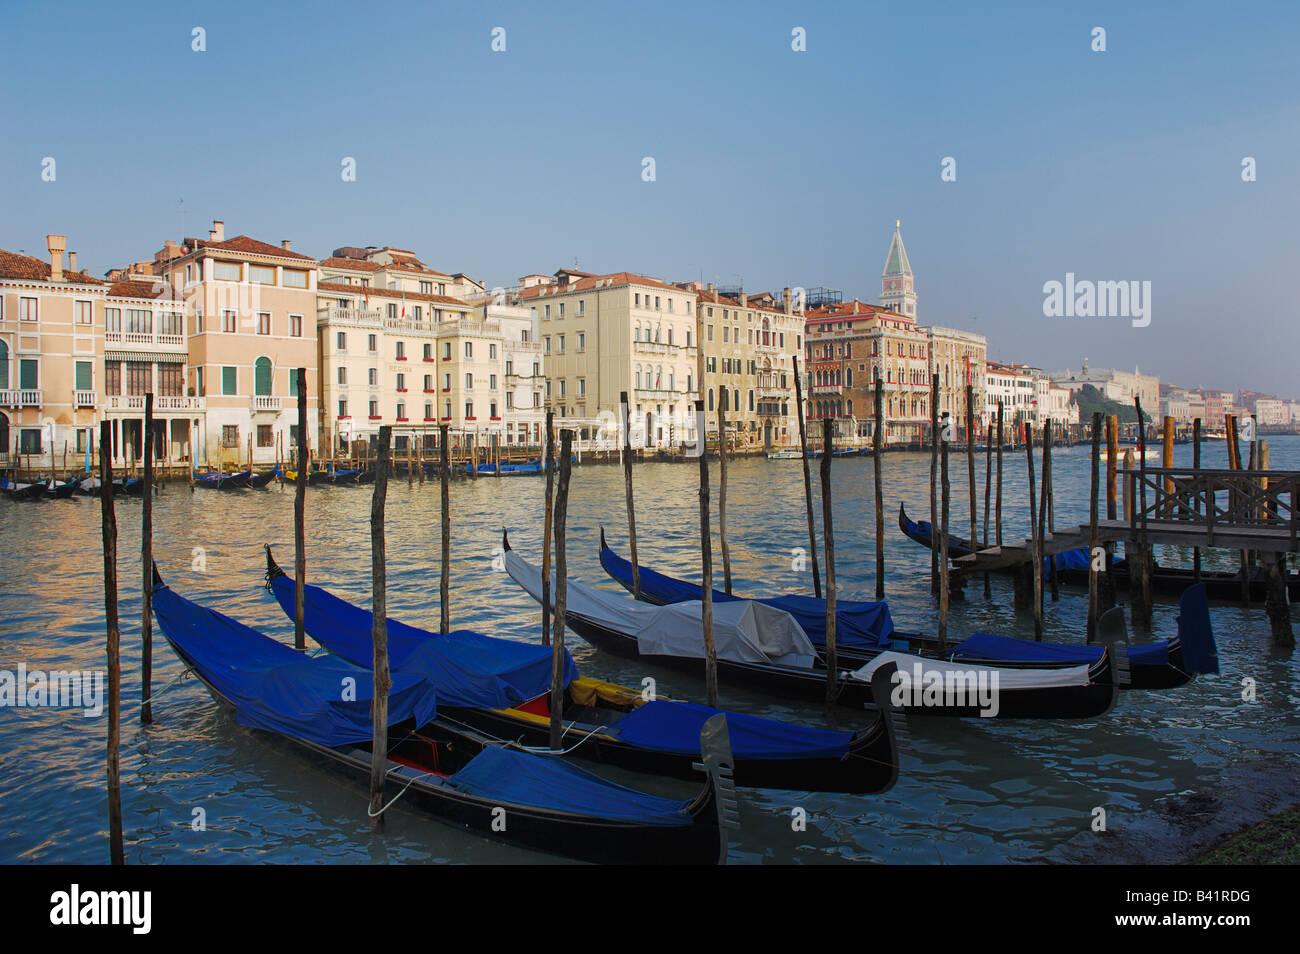 Bucht von Venedig und Palazzo Ducale di Venezia Dogen Palast Venedig Italien Europa Stockbild